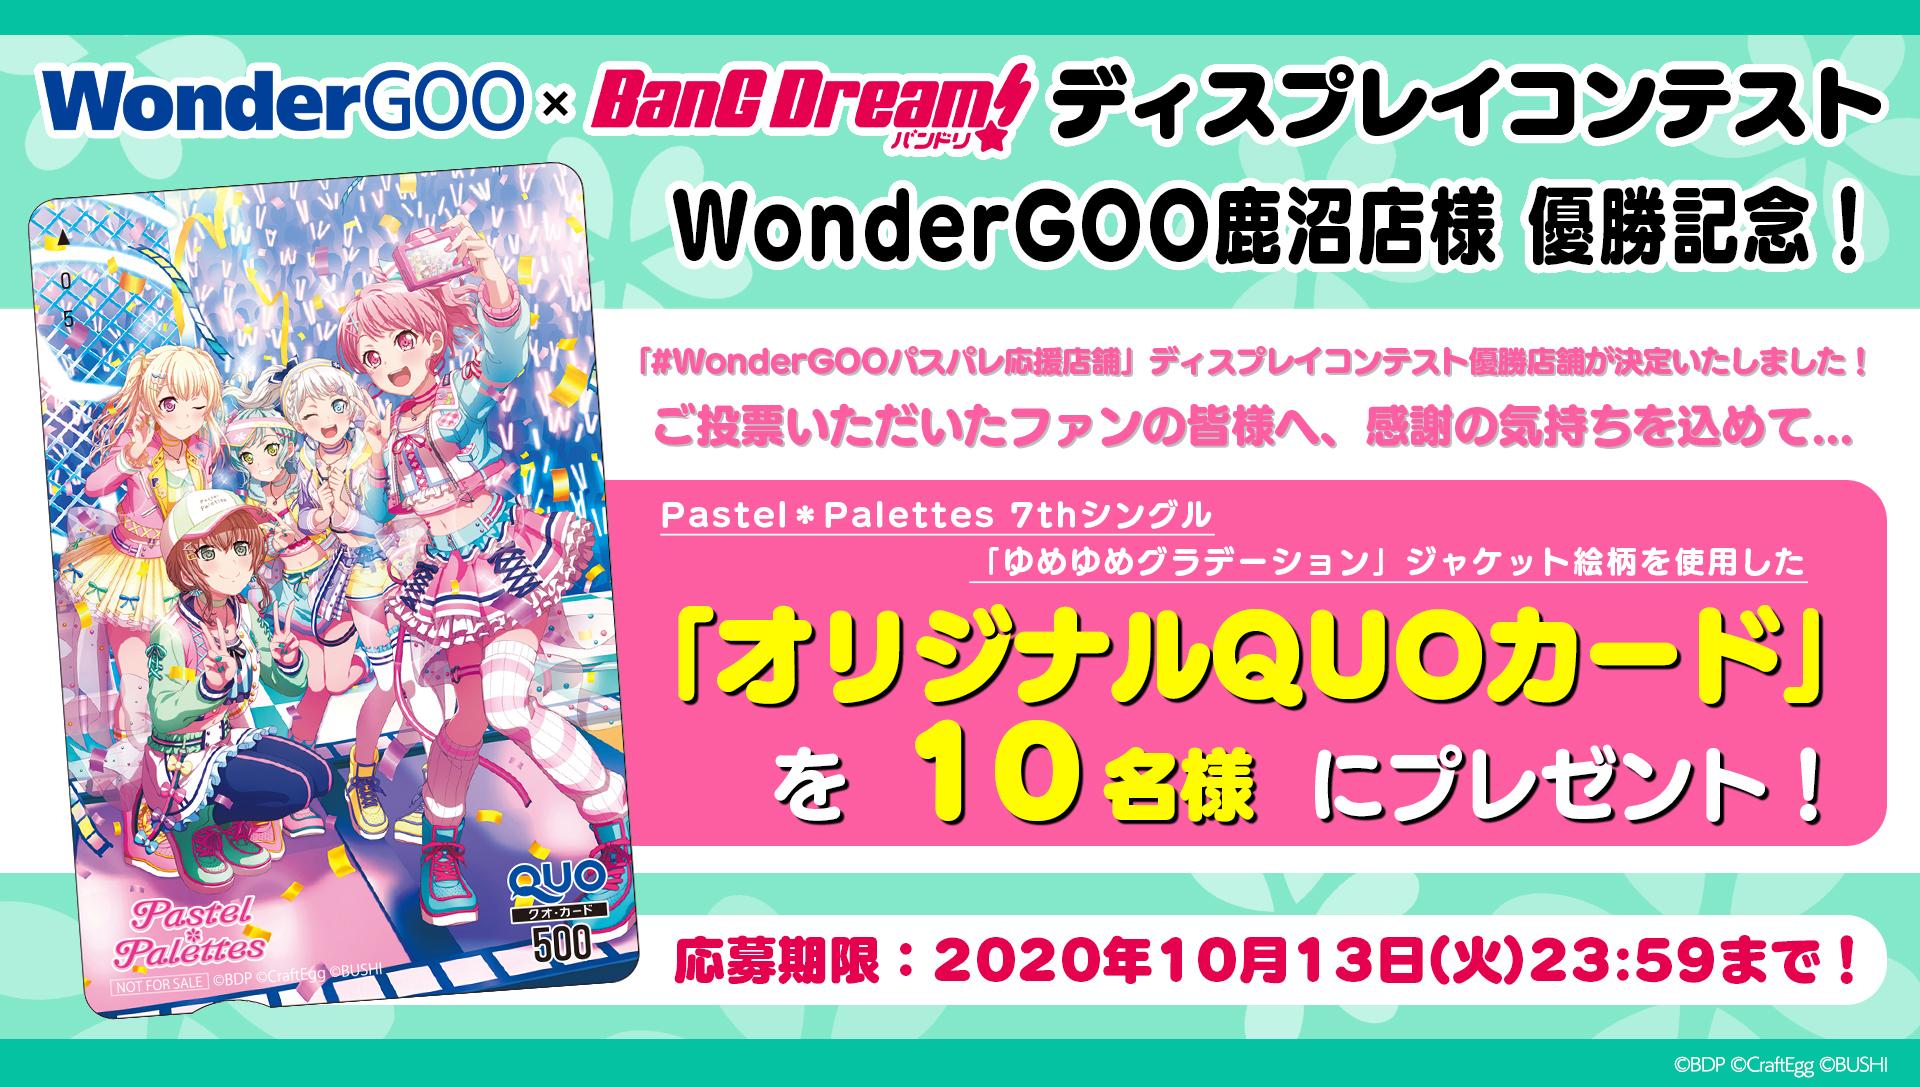 WonderGOO×BanG Dream!ディスプレイコンテストWonderGOO鹿島店優勝記念!Wフォロー&RTキャンペーン開催!